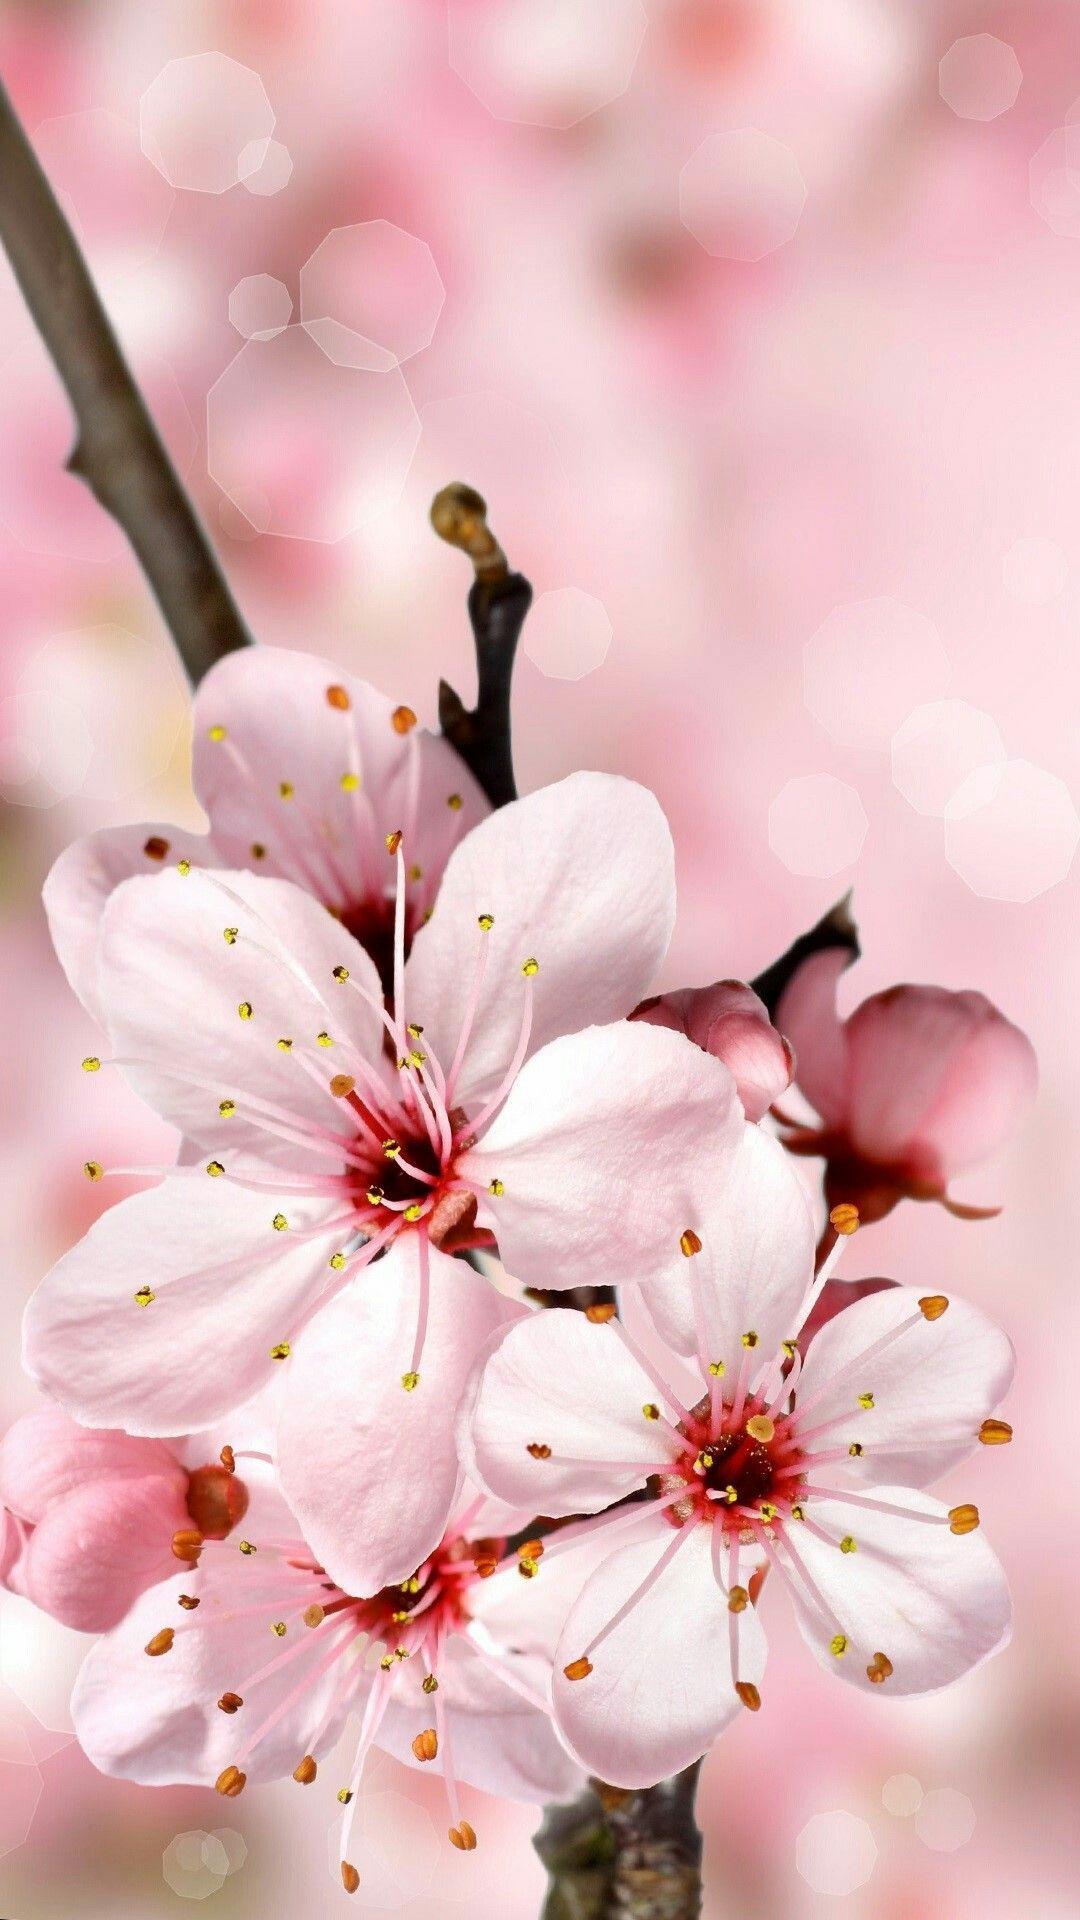 Pin by Ostrovsky on P.I.N.K. Cherry blossom